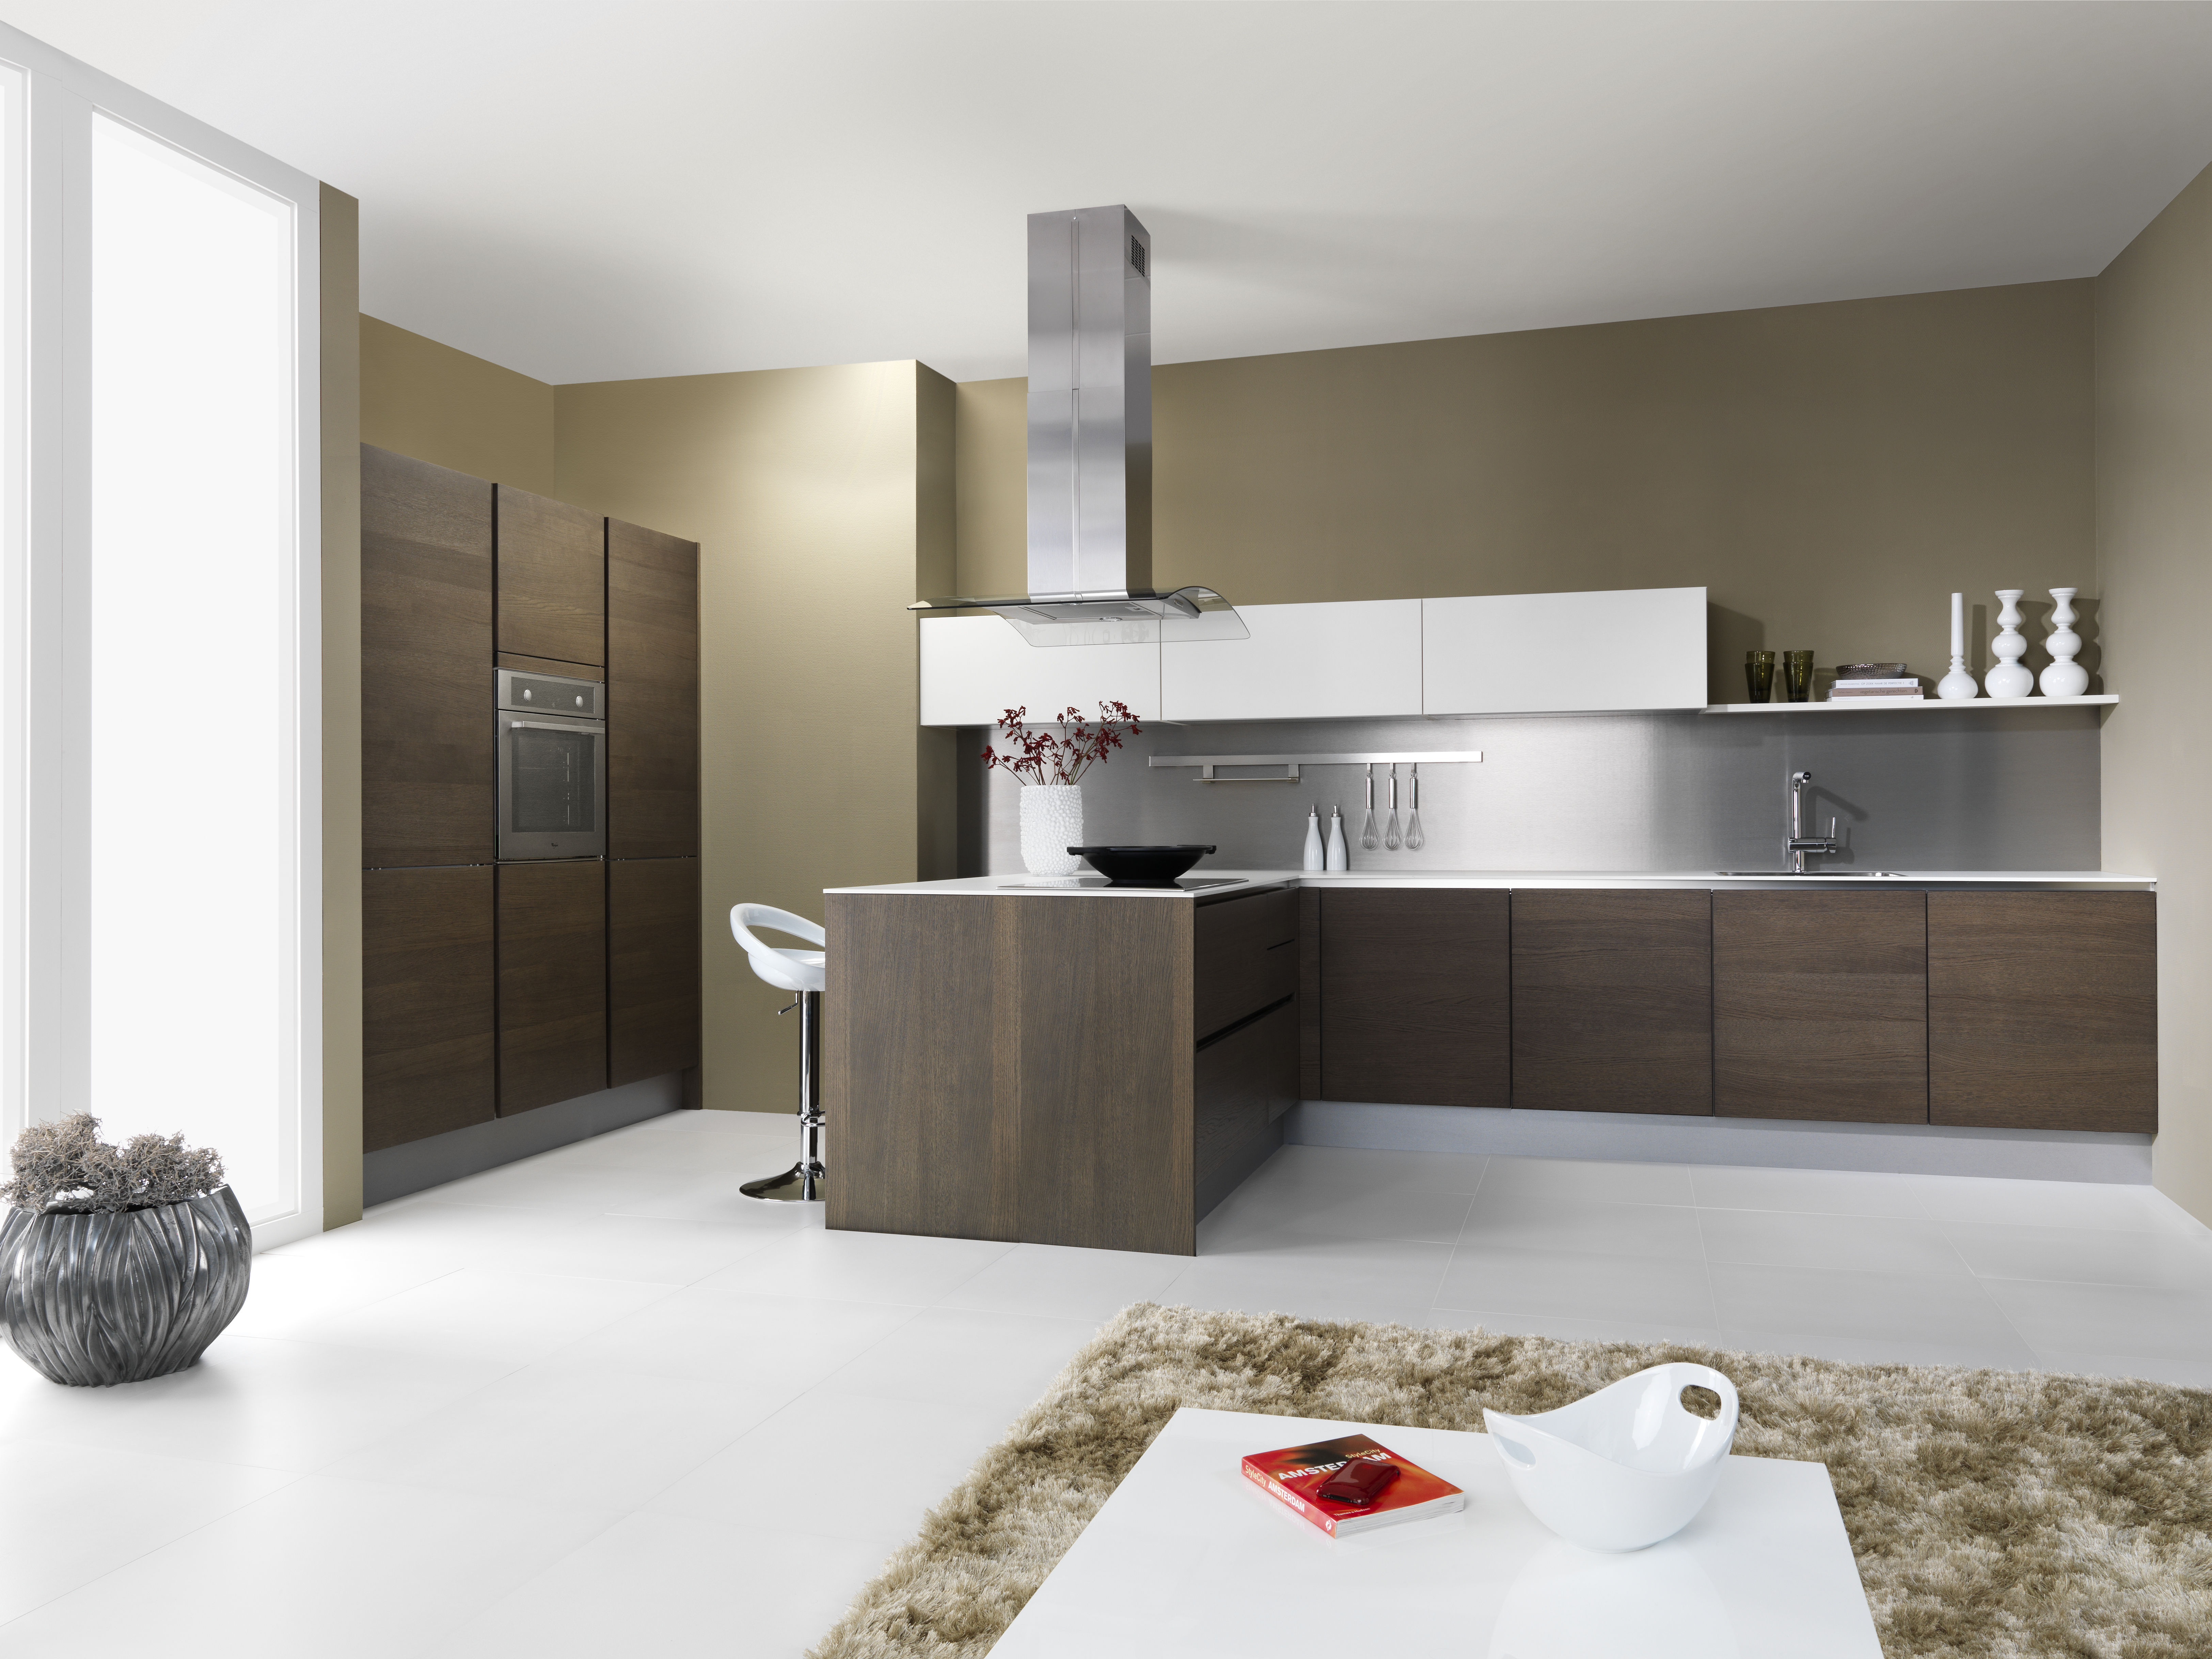 Trend in keukenland greeploze keukens keuken kampioen for Greeploze keuken